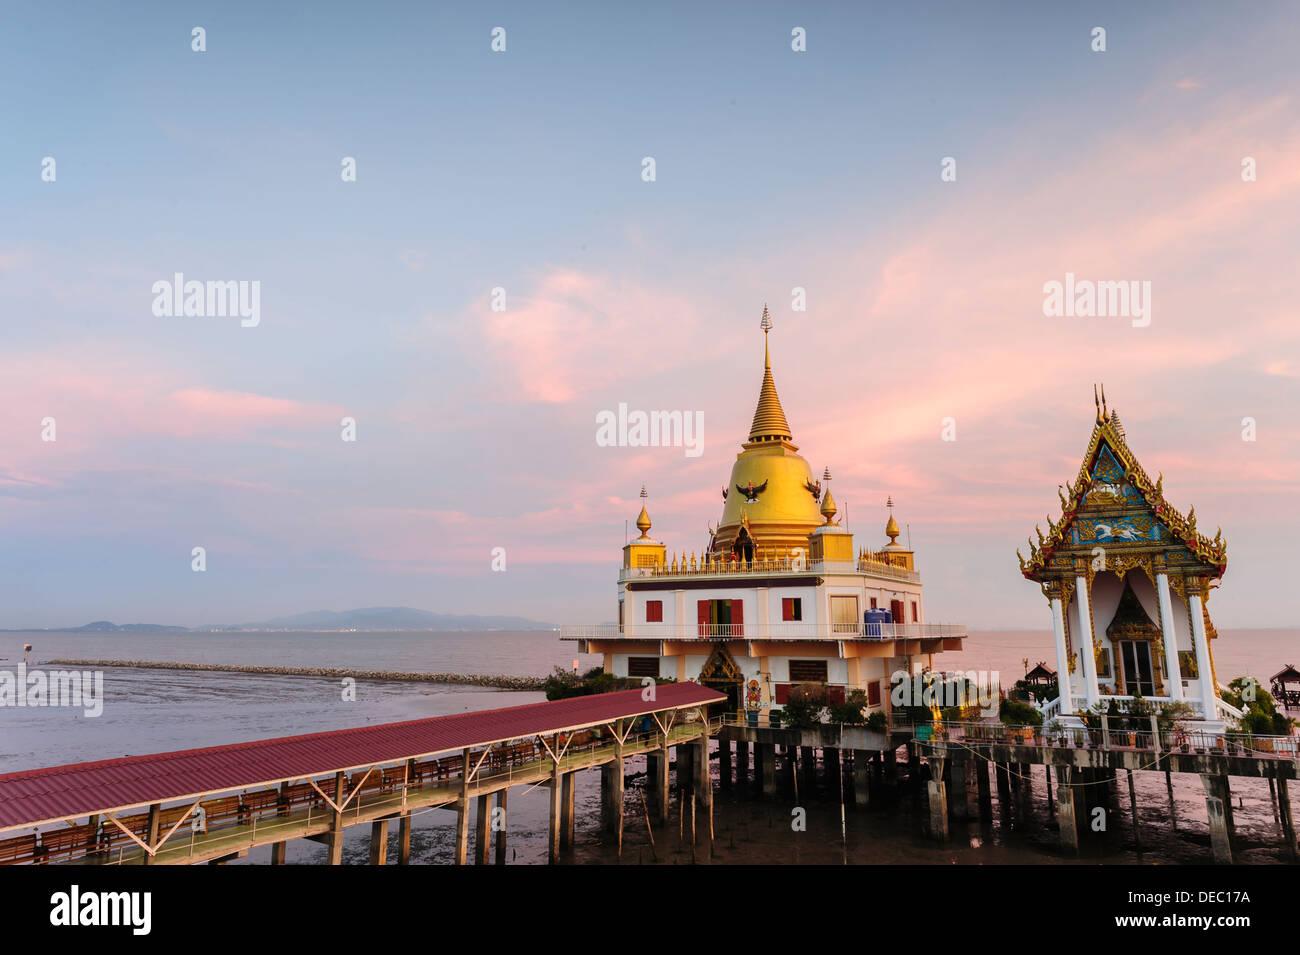 Beautiful twilight Phra Maha Pagoda Ganges Precha Prapakorn (Middle sea pagoda), Wat Hong Thong, Chachoengsao Province, Thailand - Stock Image